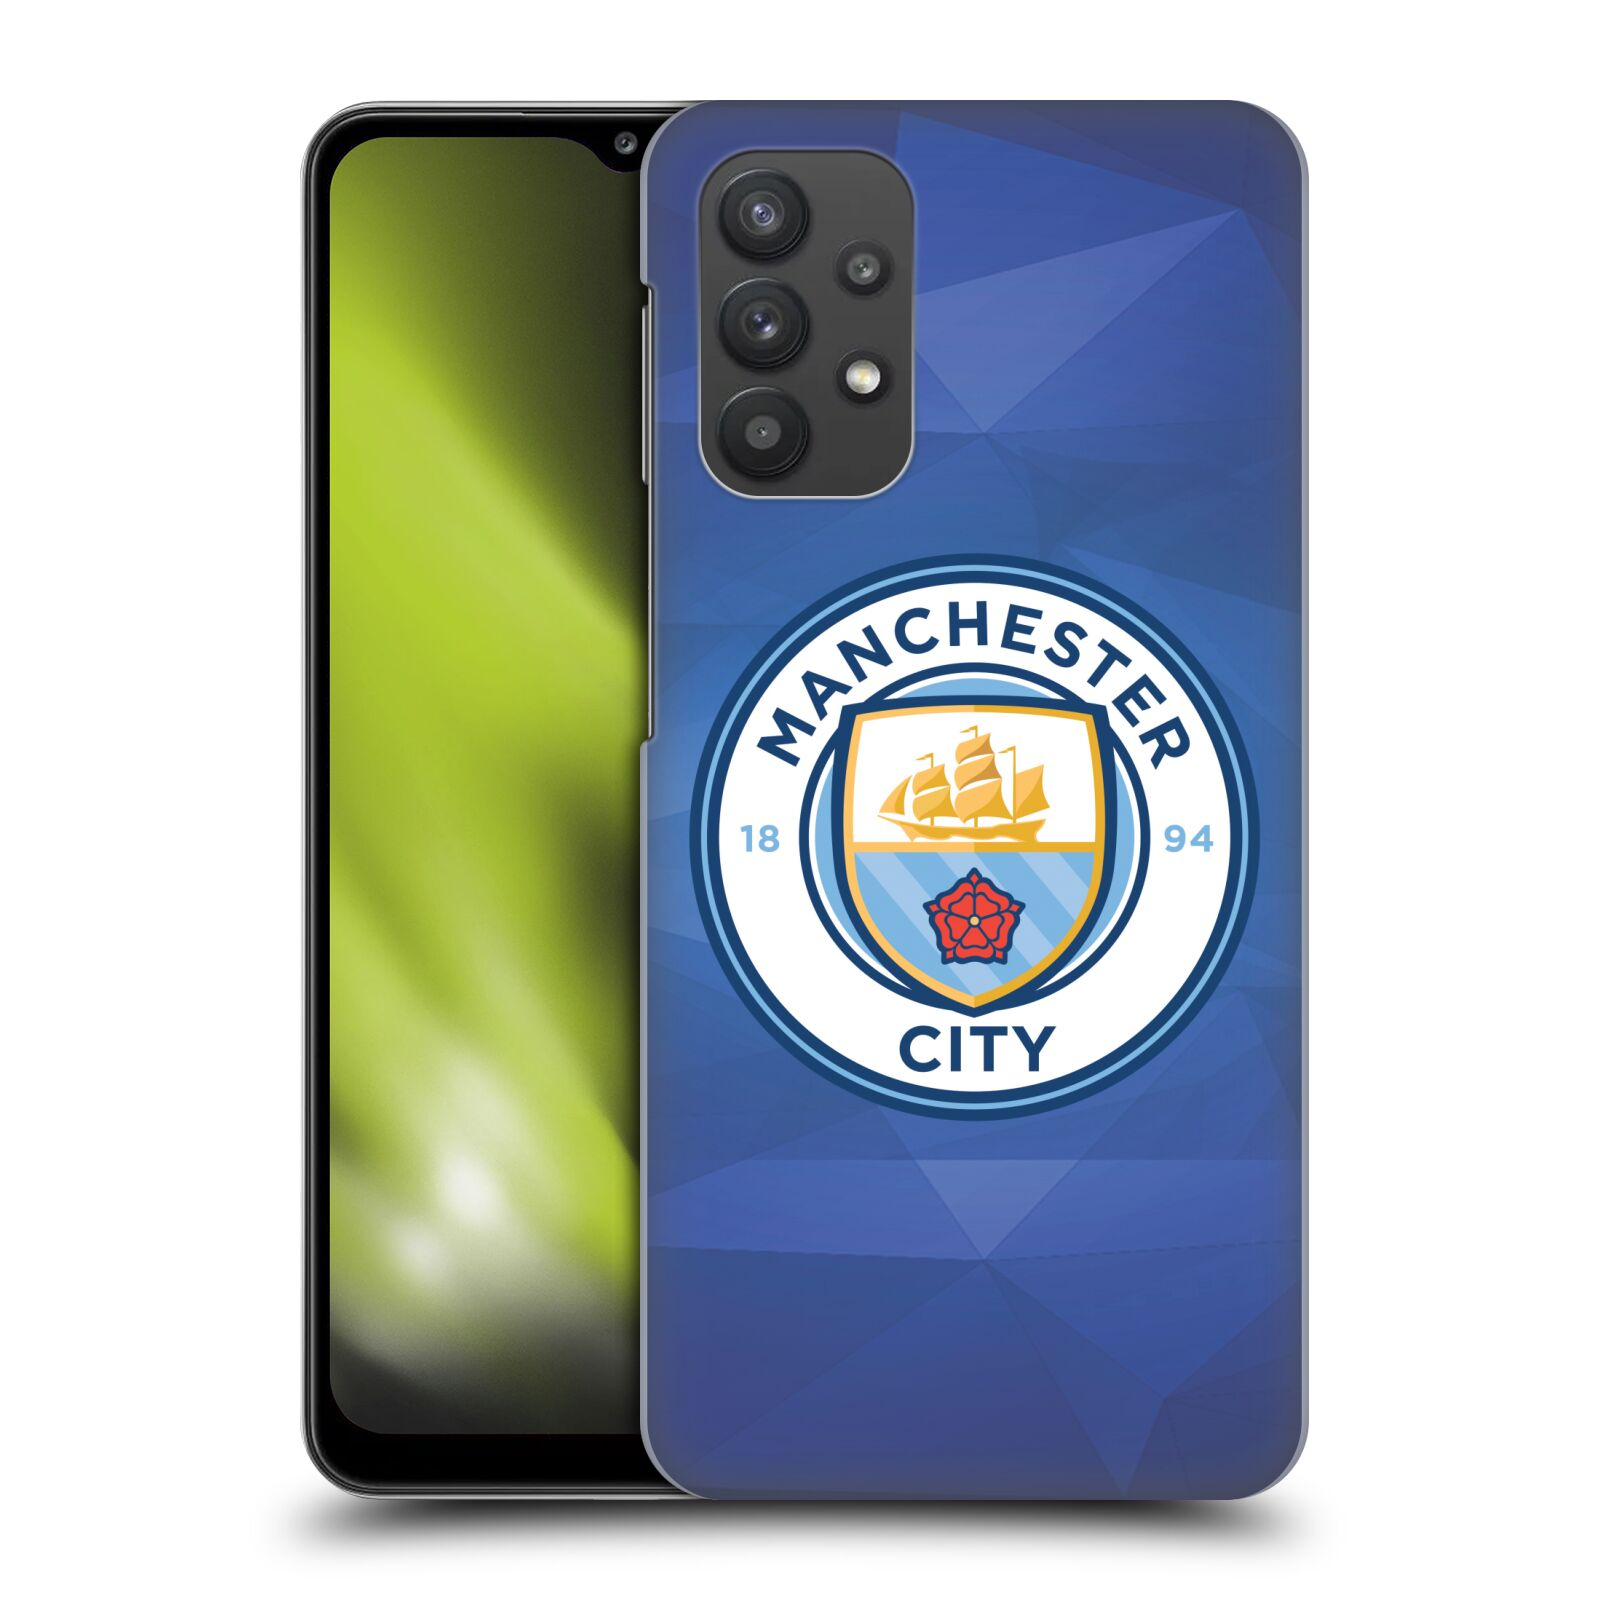 Plastové pouzdro na mobil Samsung Galaxy A32 5G - Head Case - Manchester City FC - Modré nové logo